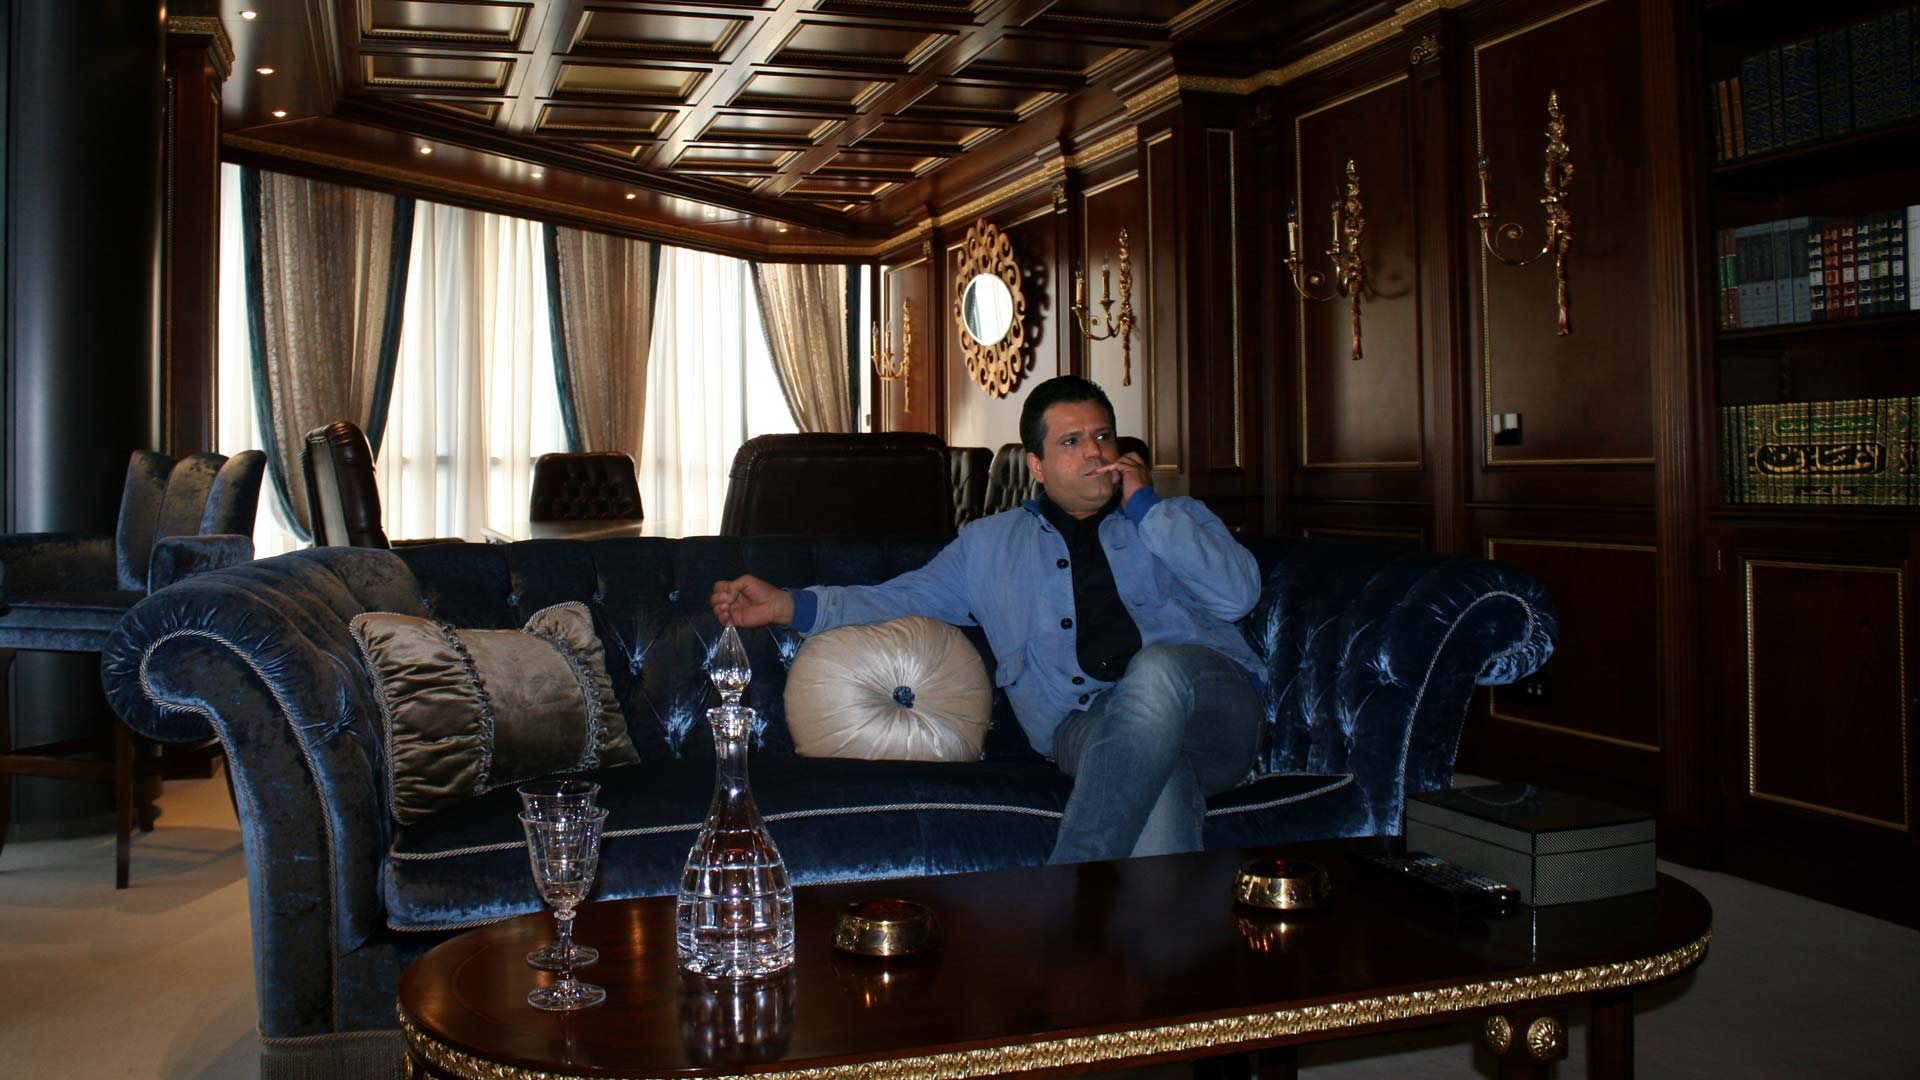 30-tnelec2014-presidentielle-upl-riahi-salon-1920-inkyfada